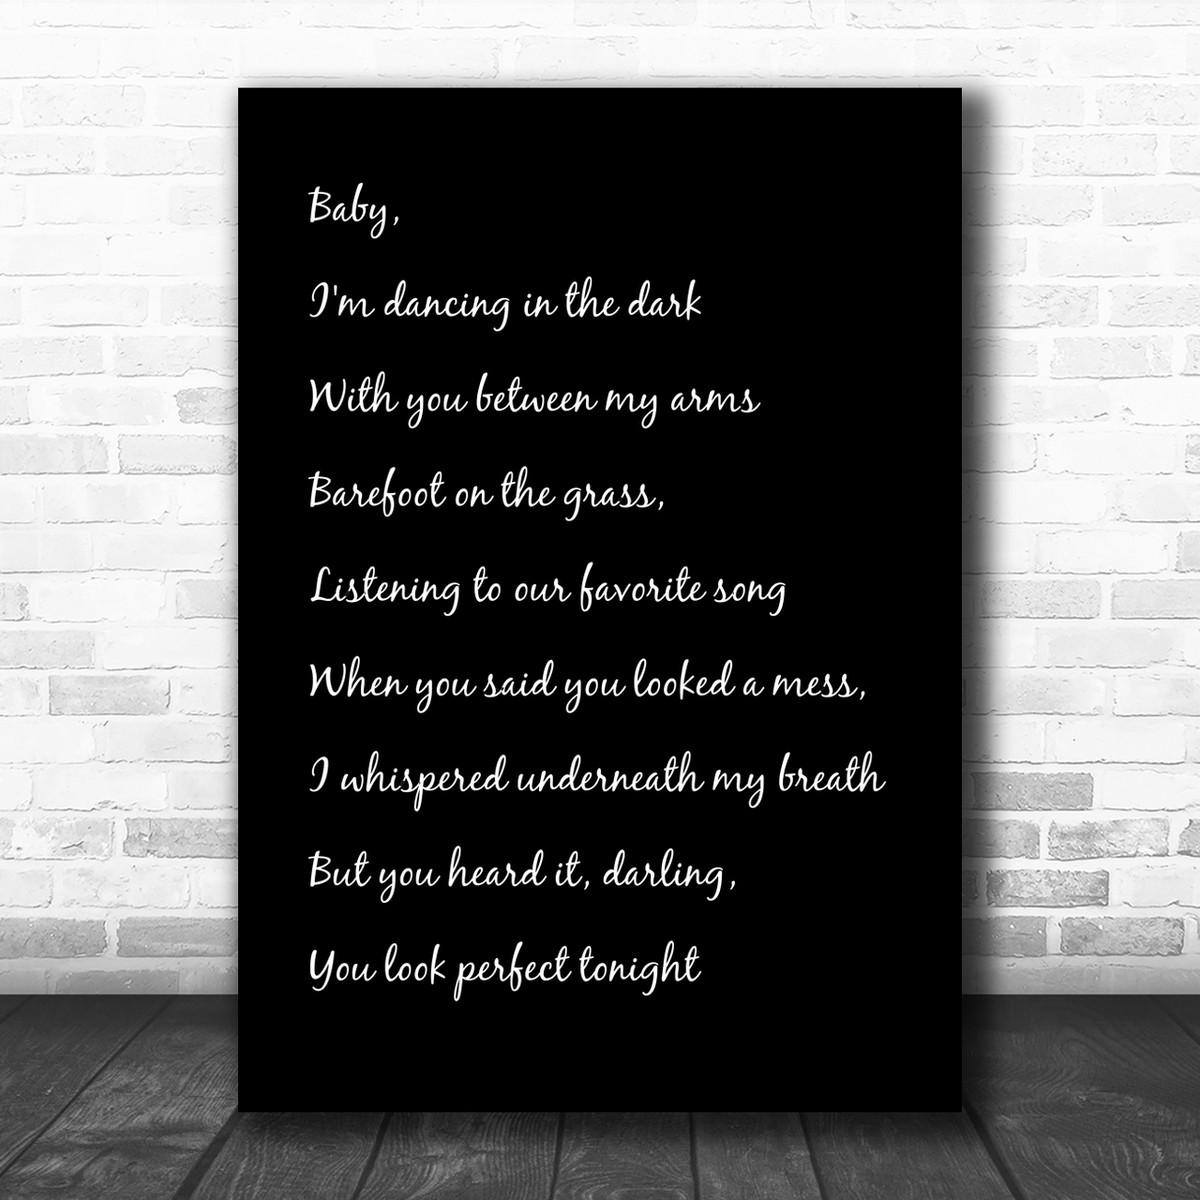 Black White & Black Ed Sheeran Perfect Song Lyric Music Wall Art Print